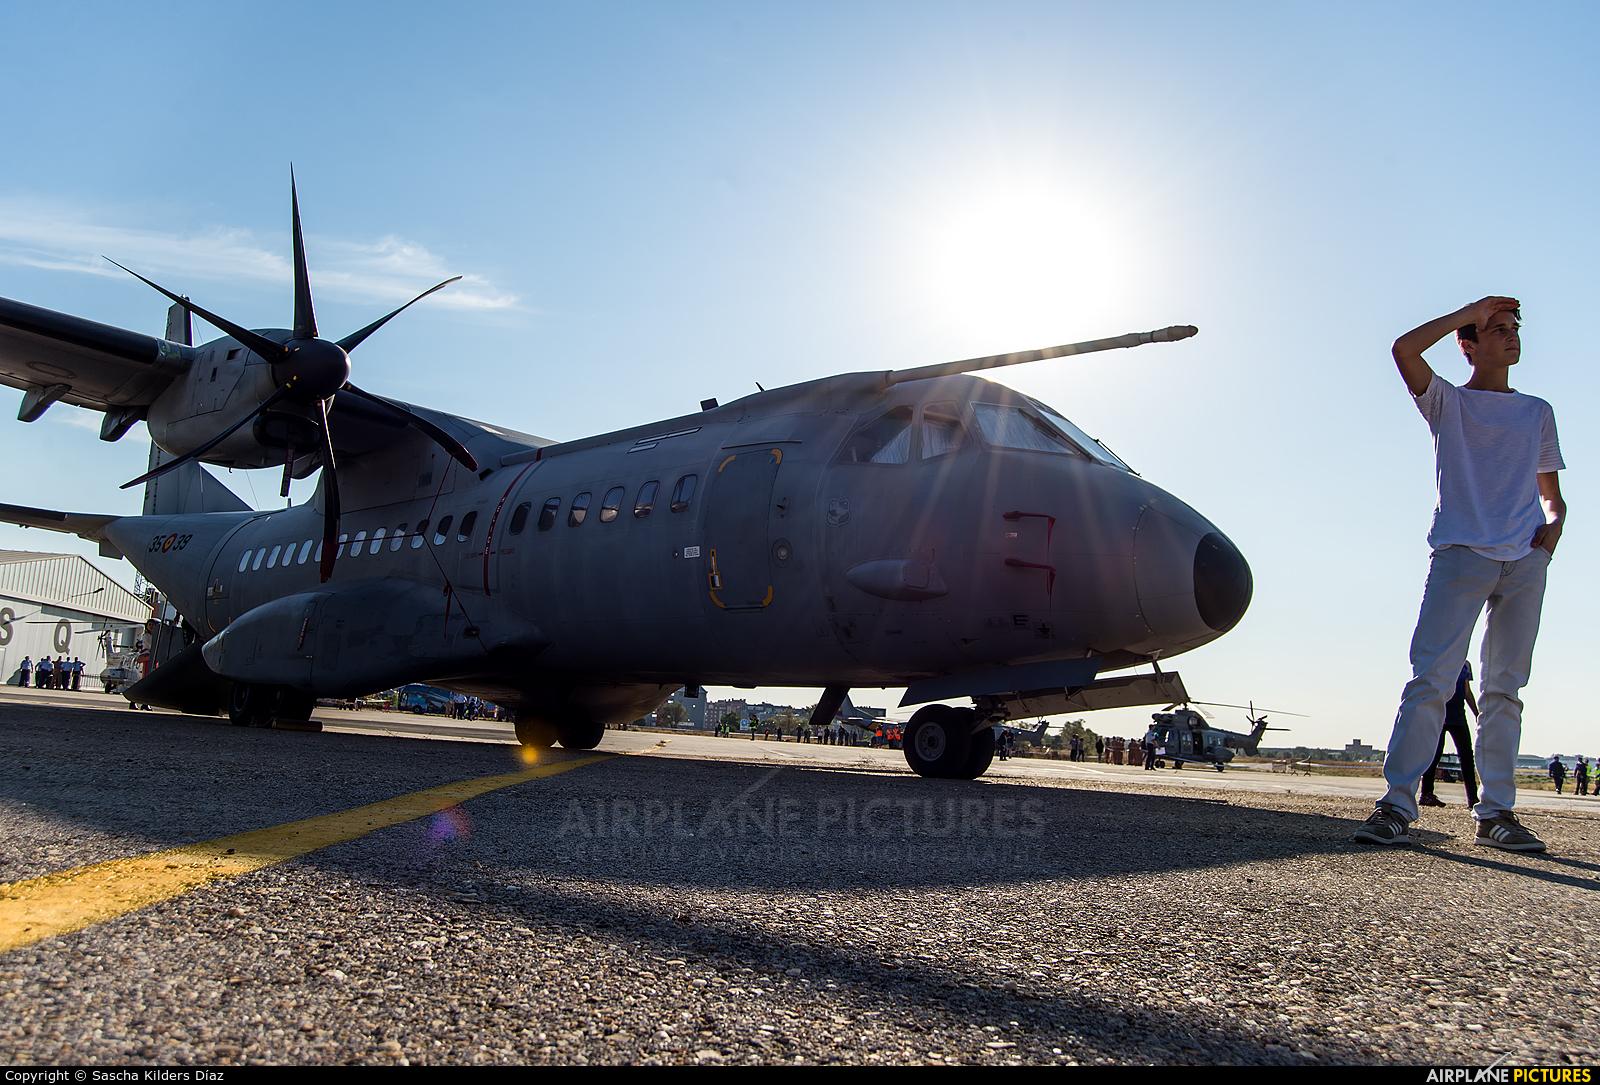 Spain - Air Force T.21-01 aircraft at Madrid - Cuatro Vientos